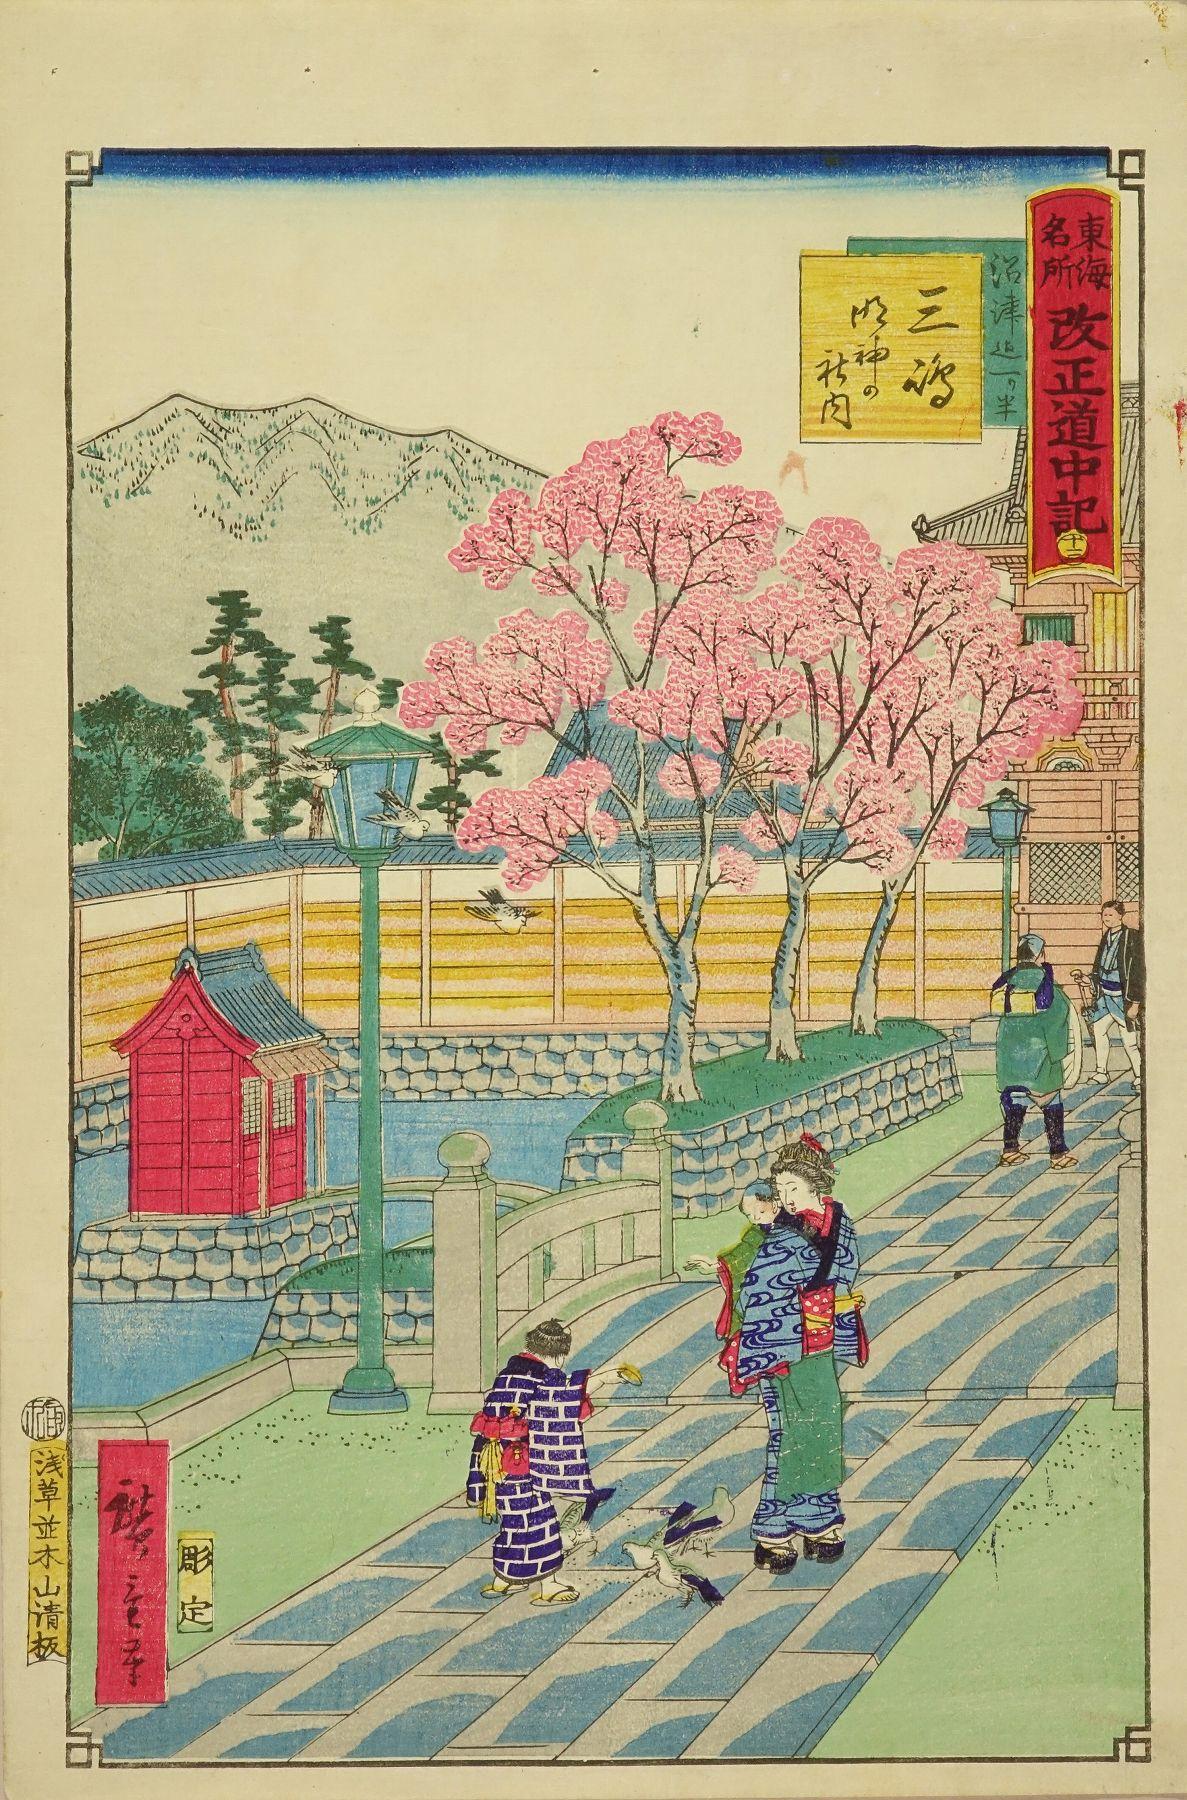 HIROSHIGE III Mishima, Ground of the shrine, from <i>Tokai meisho kaisei dochukii</i> (Newly edited travel story of famous places of the Tokaido)